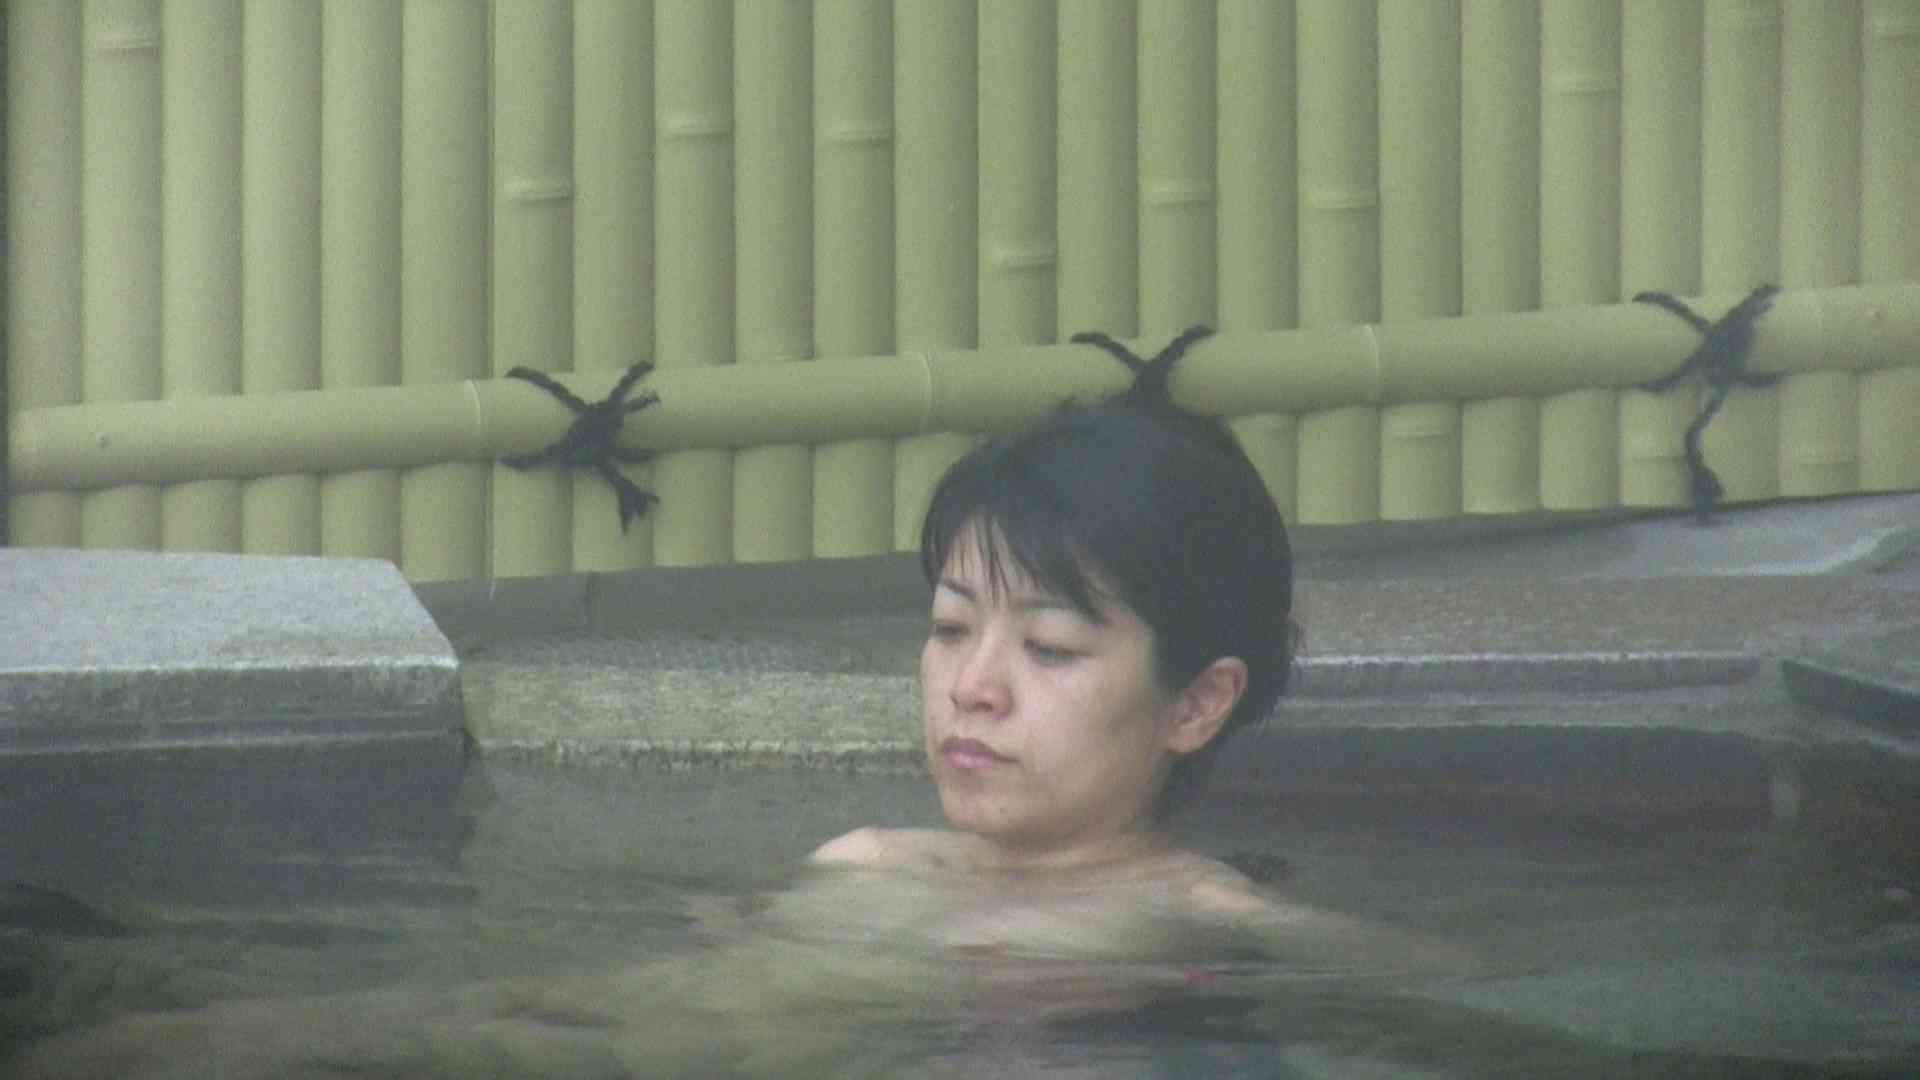 Aquaな露天風呂Vol.585 盗撮 | OLエロ画像  78PICs 61